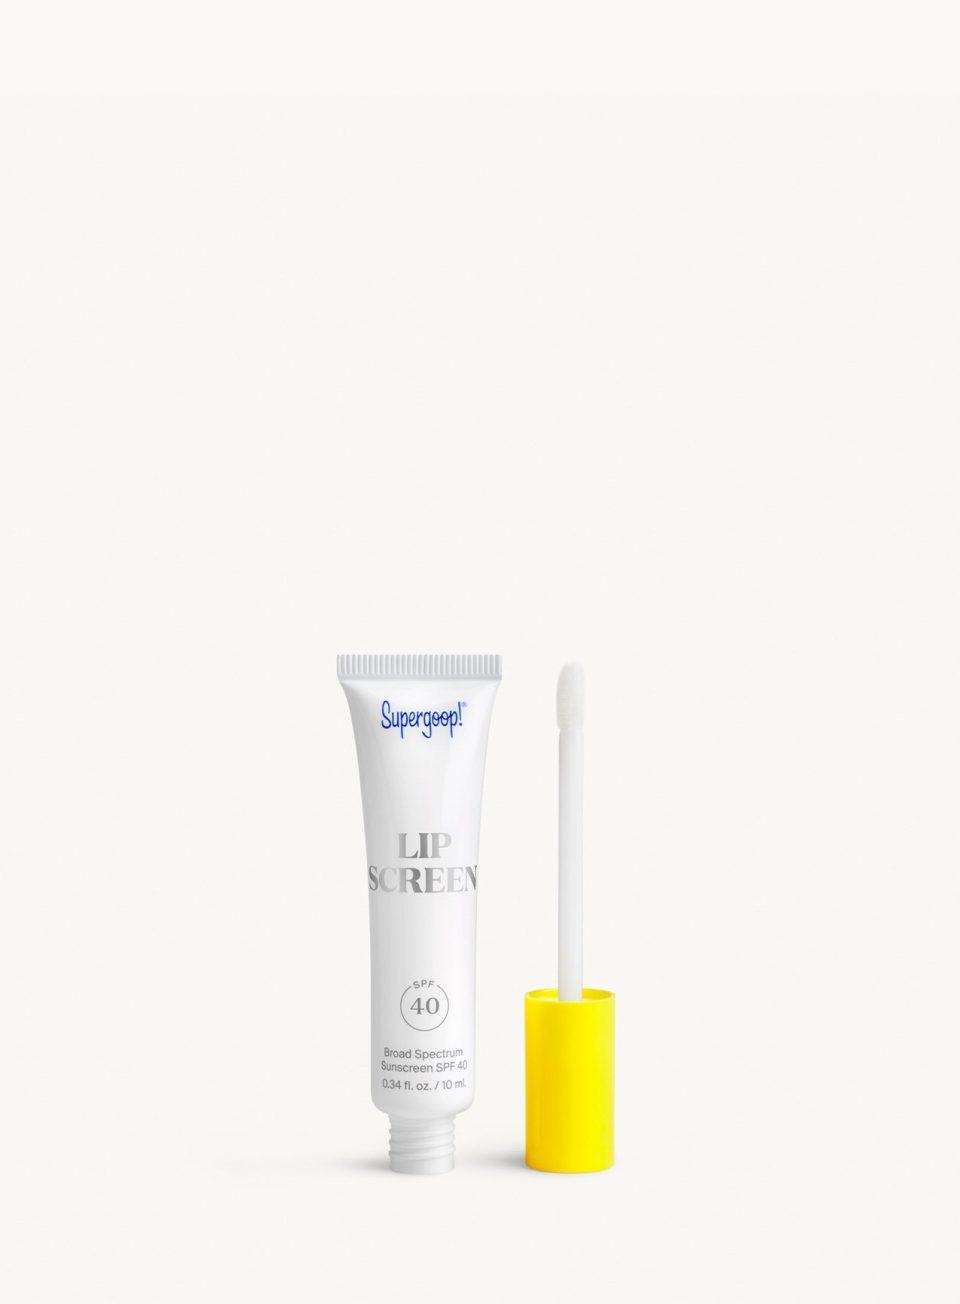 Supergoop! Lipscreen SPF 40